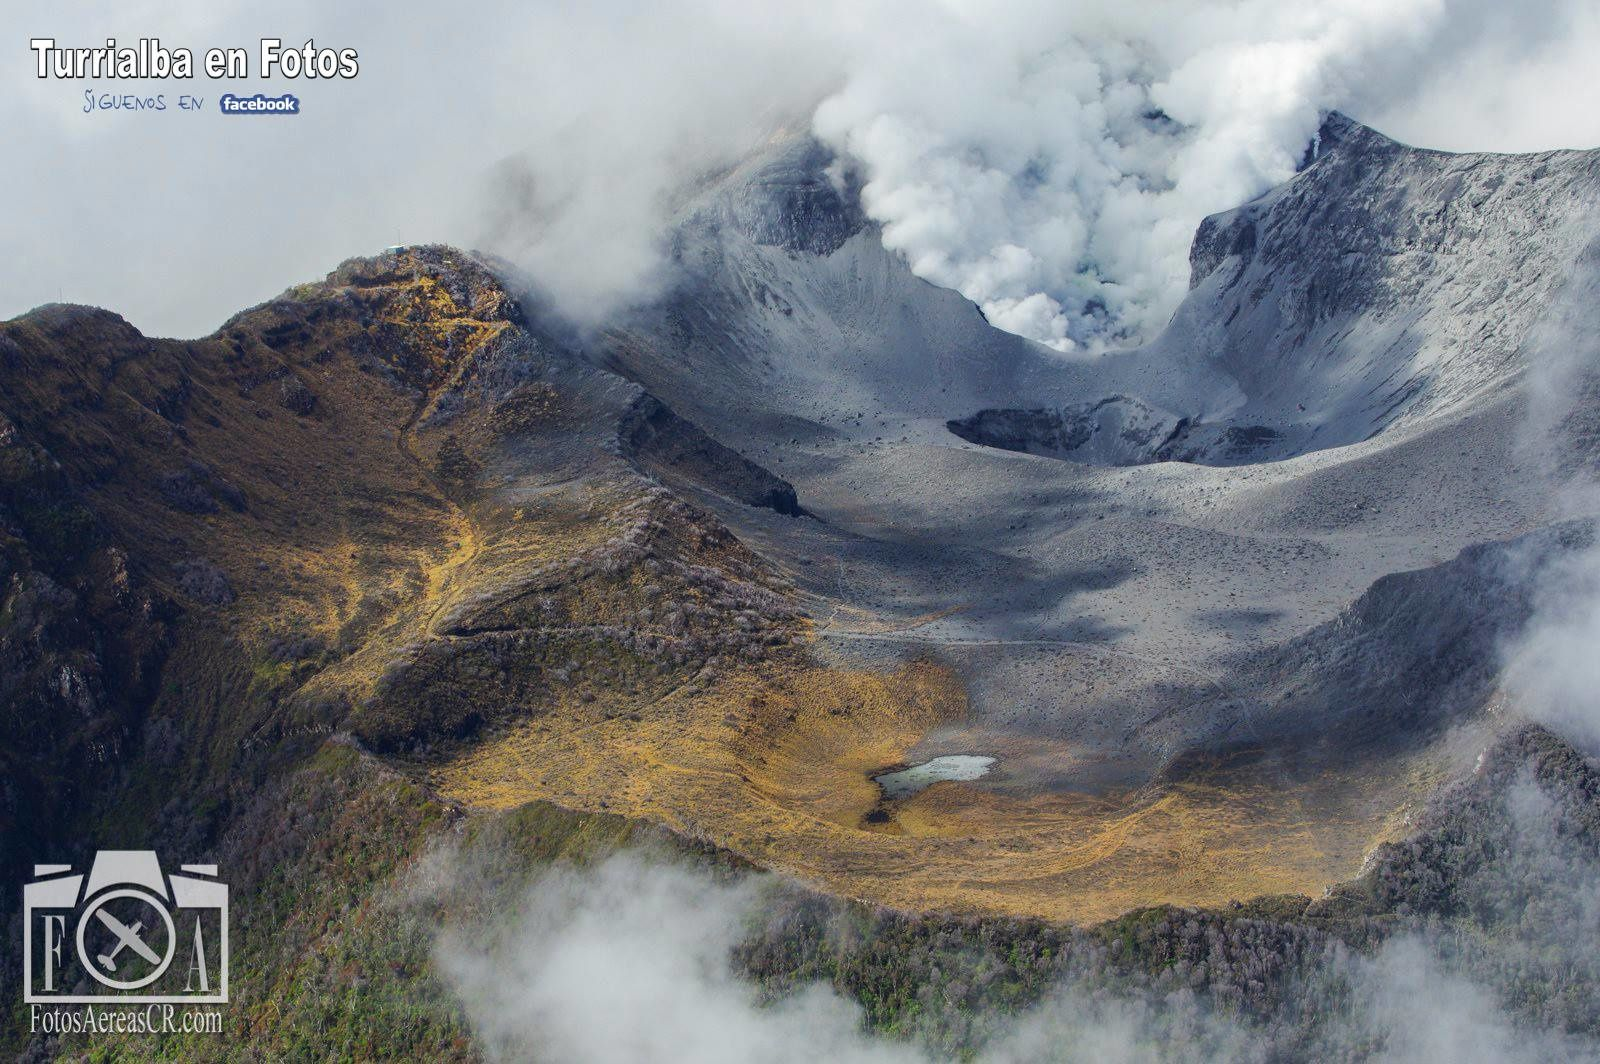 Le cratère sud-ouest du Turrialba en novembre 2014 - photo André Quiros / fotos Aereas de Costa Rica